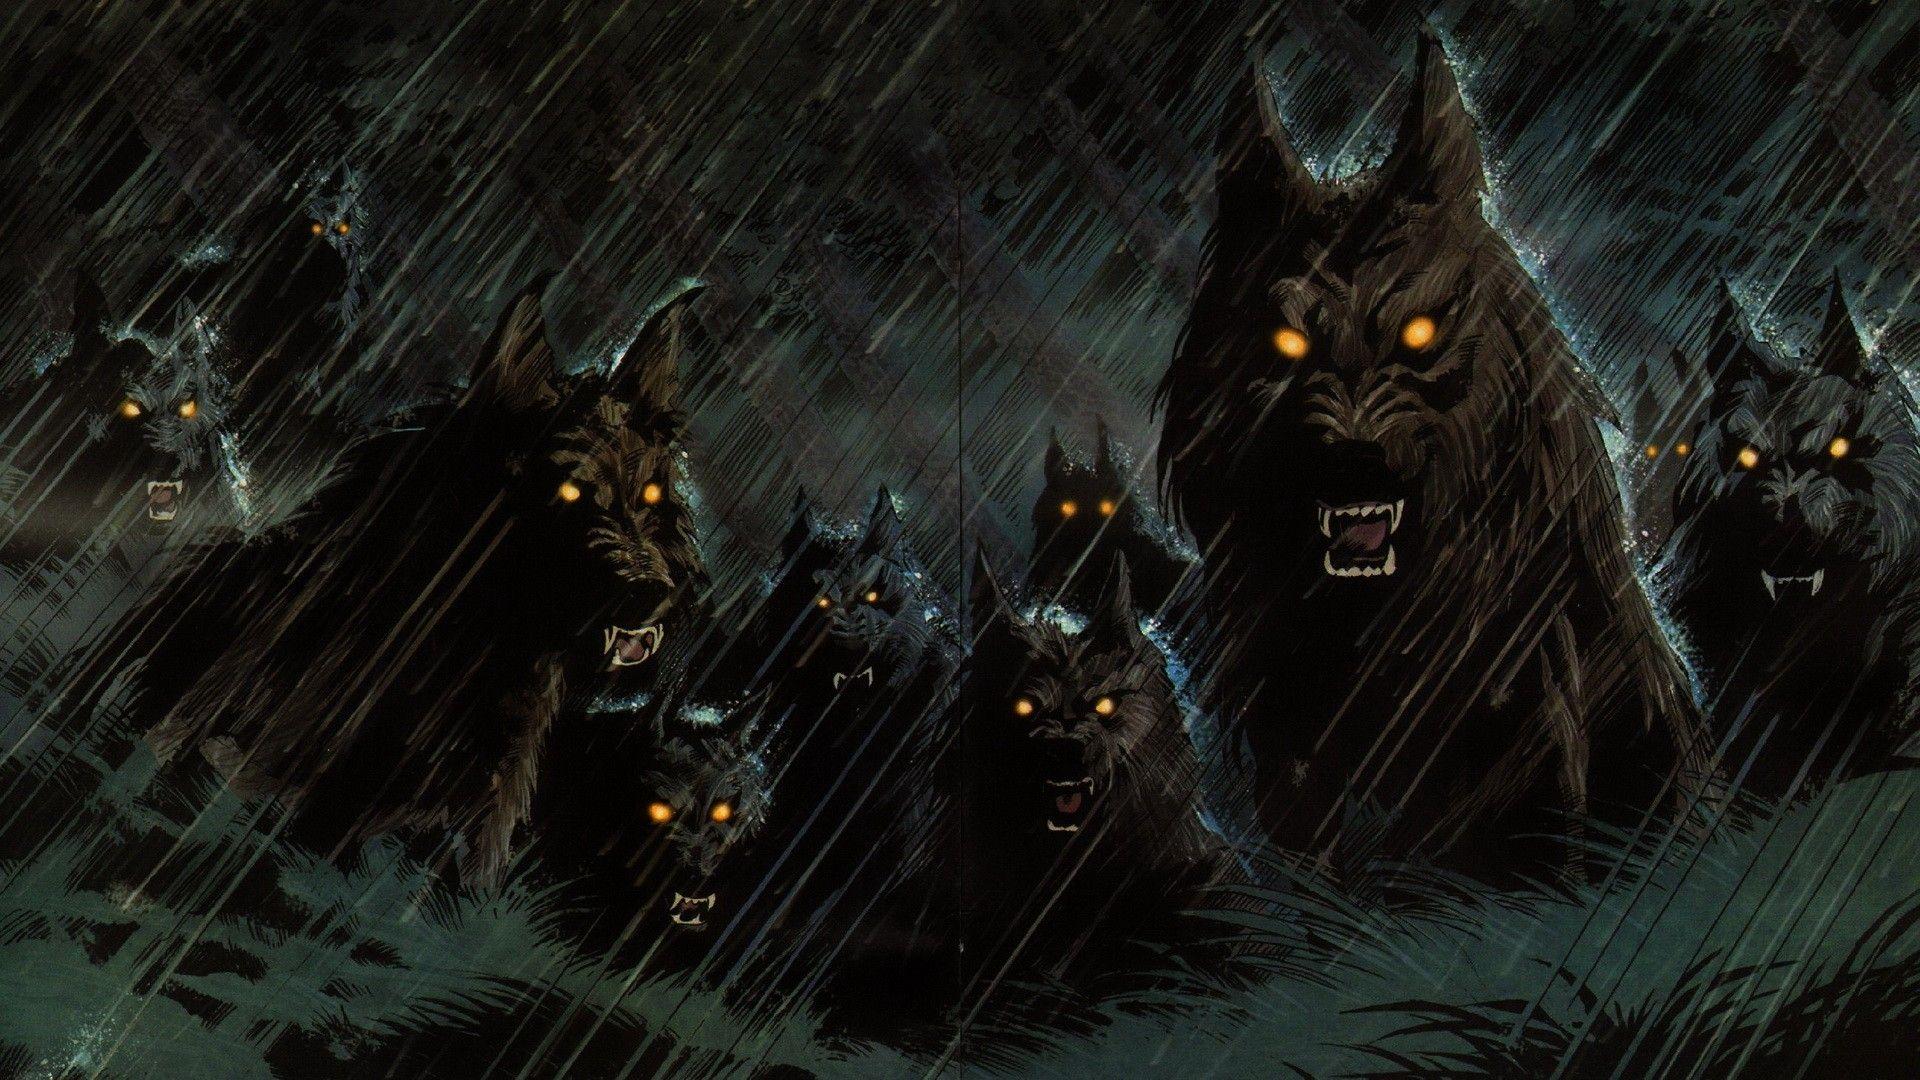 Hd wallpaper evil - Images Of Werewolves Werewolf Hd Wallpaper Background For Desktop